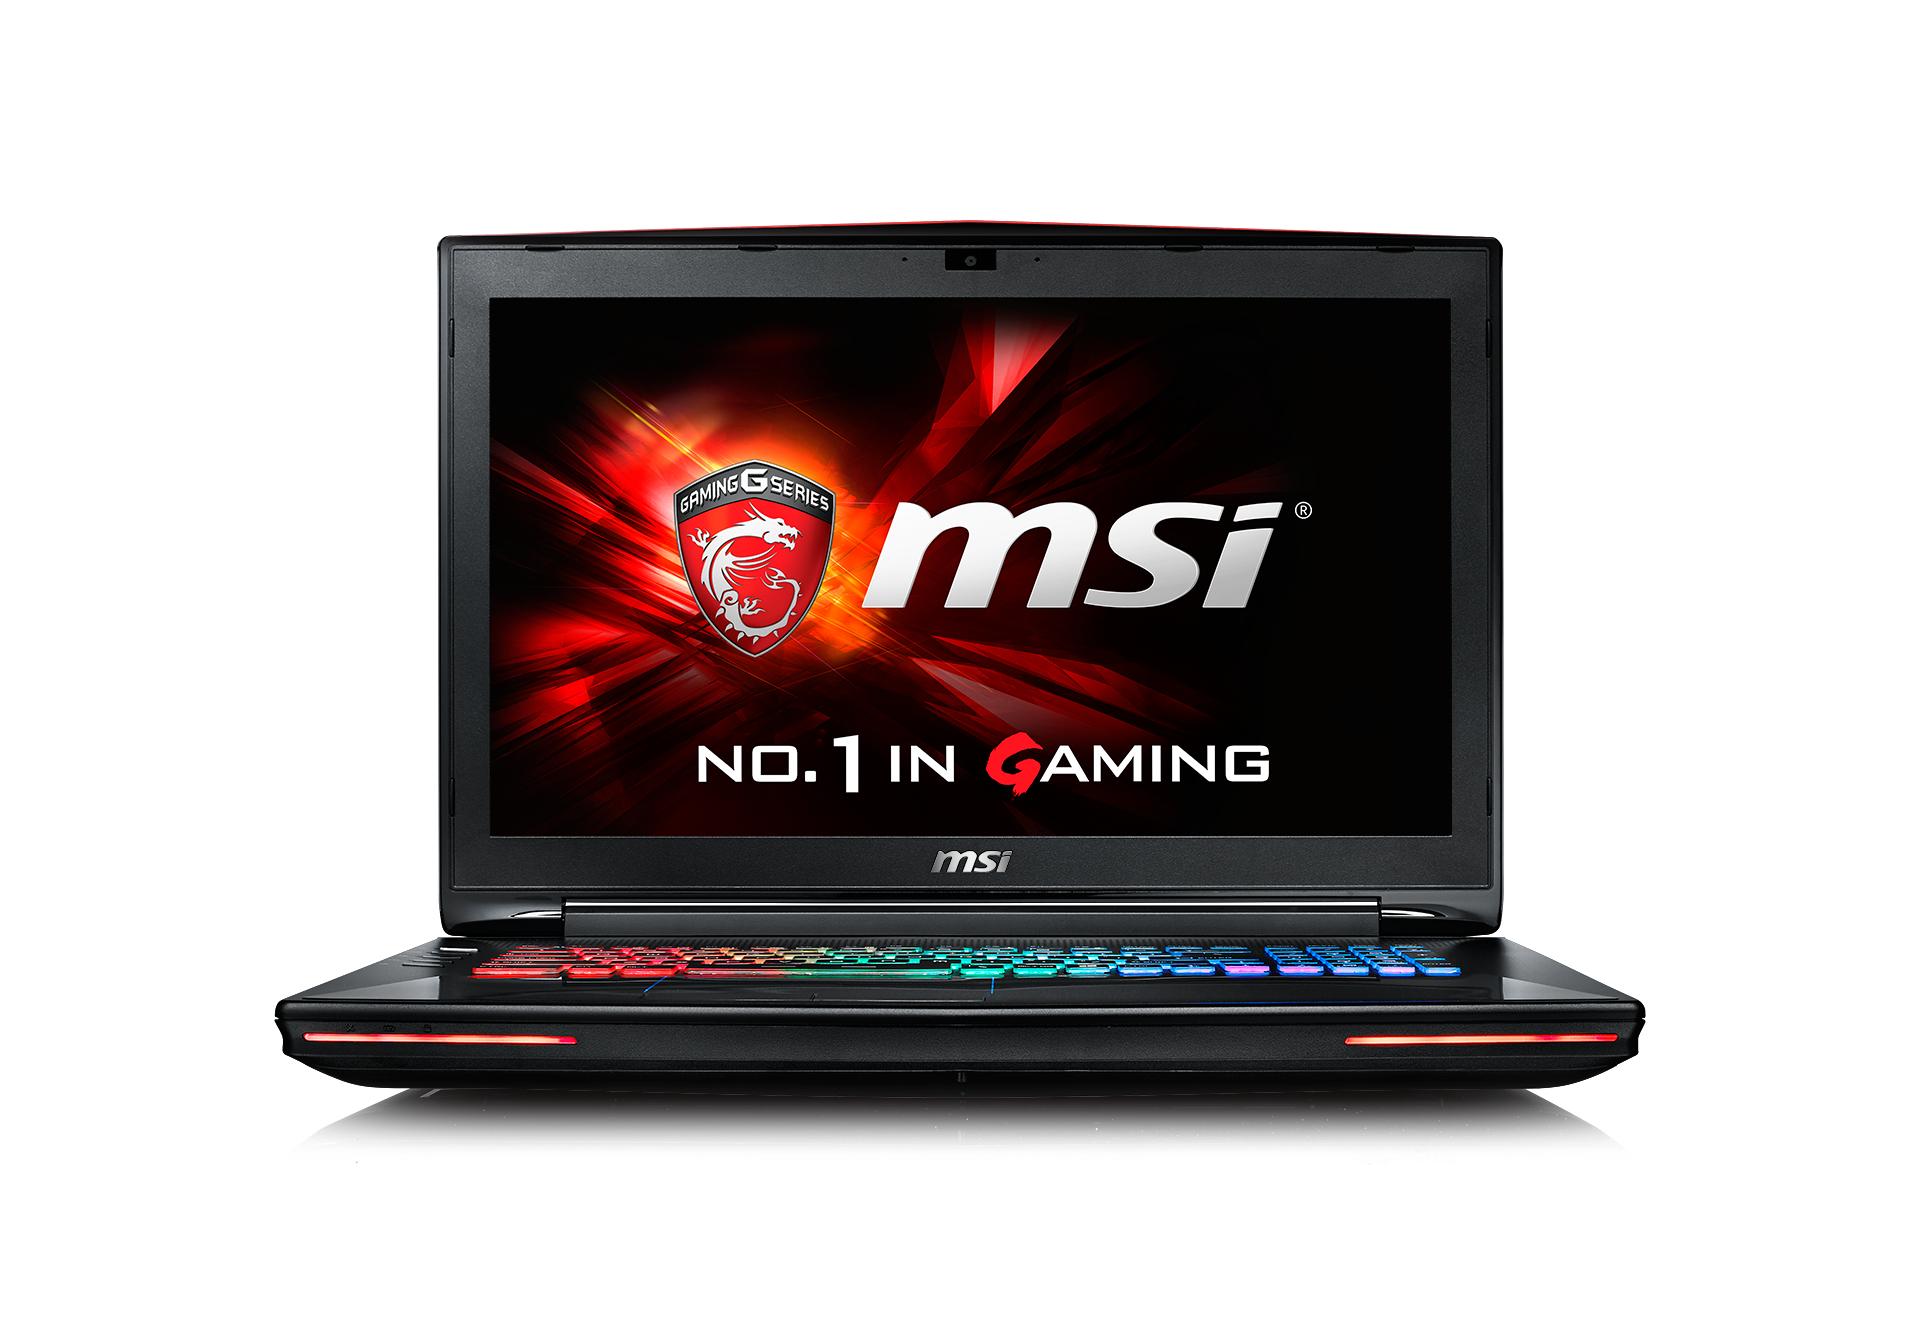 "MSI Gaming GT72S 6QE(Dominator Pro G)-1032UK 2.7GHz i7-6820HK 17.3"" 1920 x 1080pixels Black"